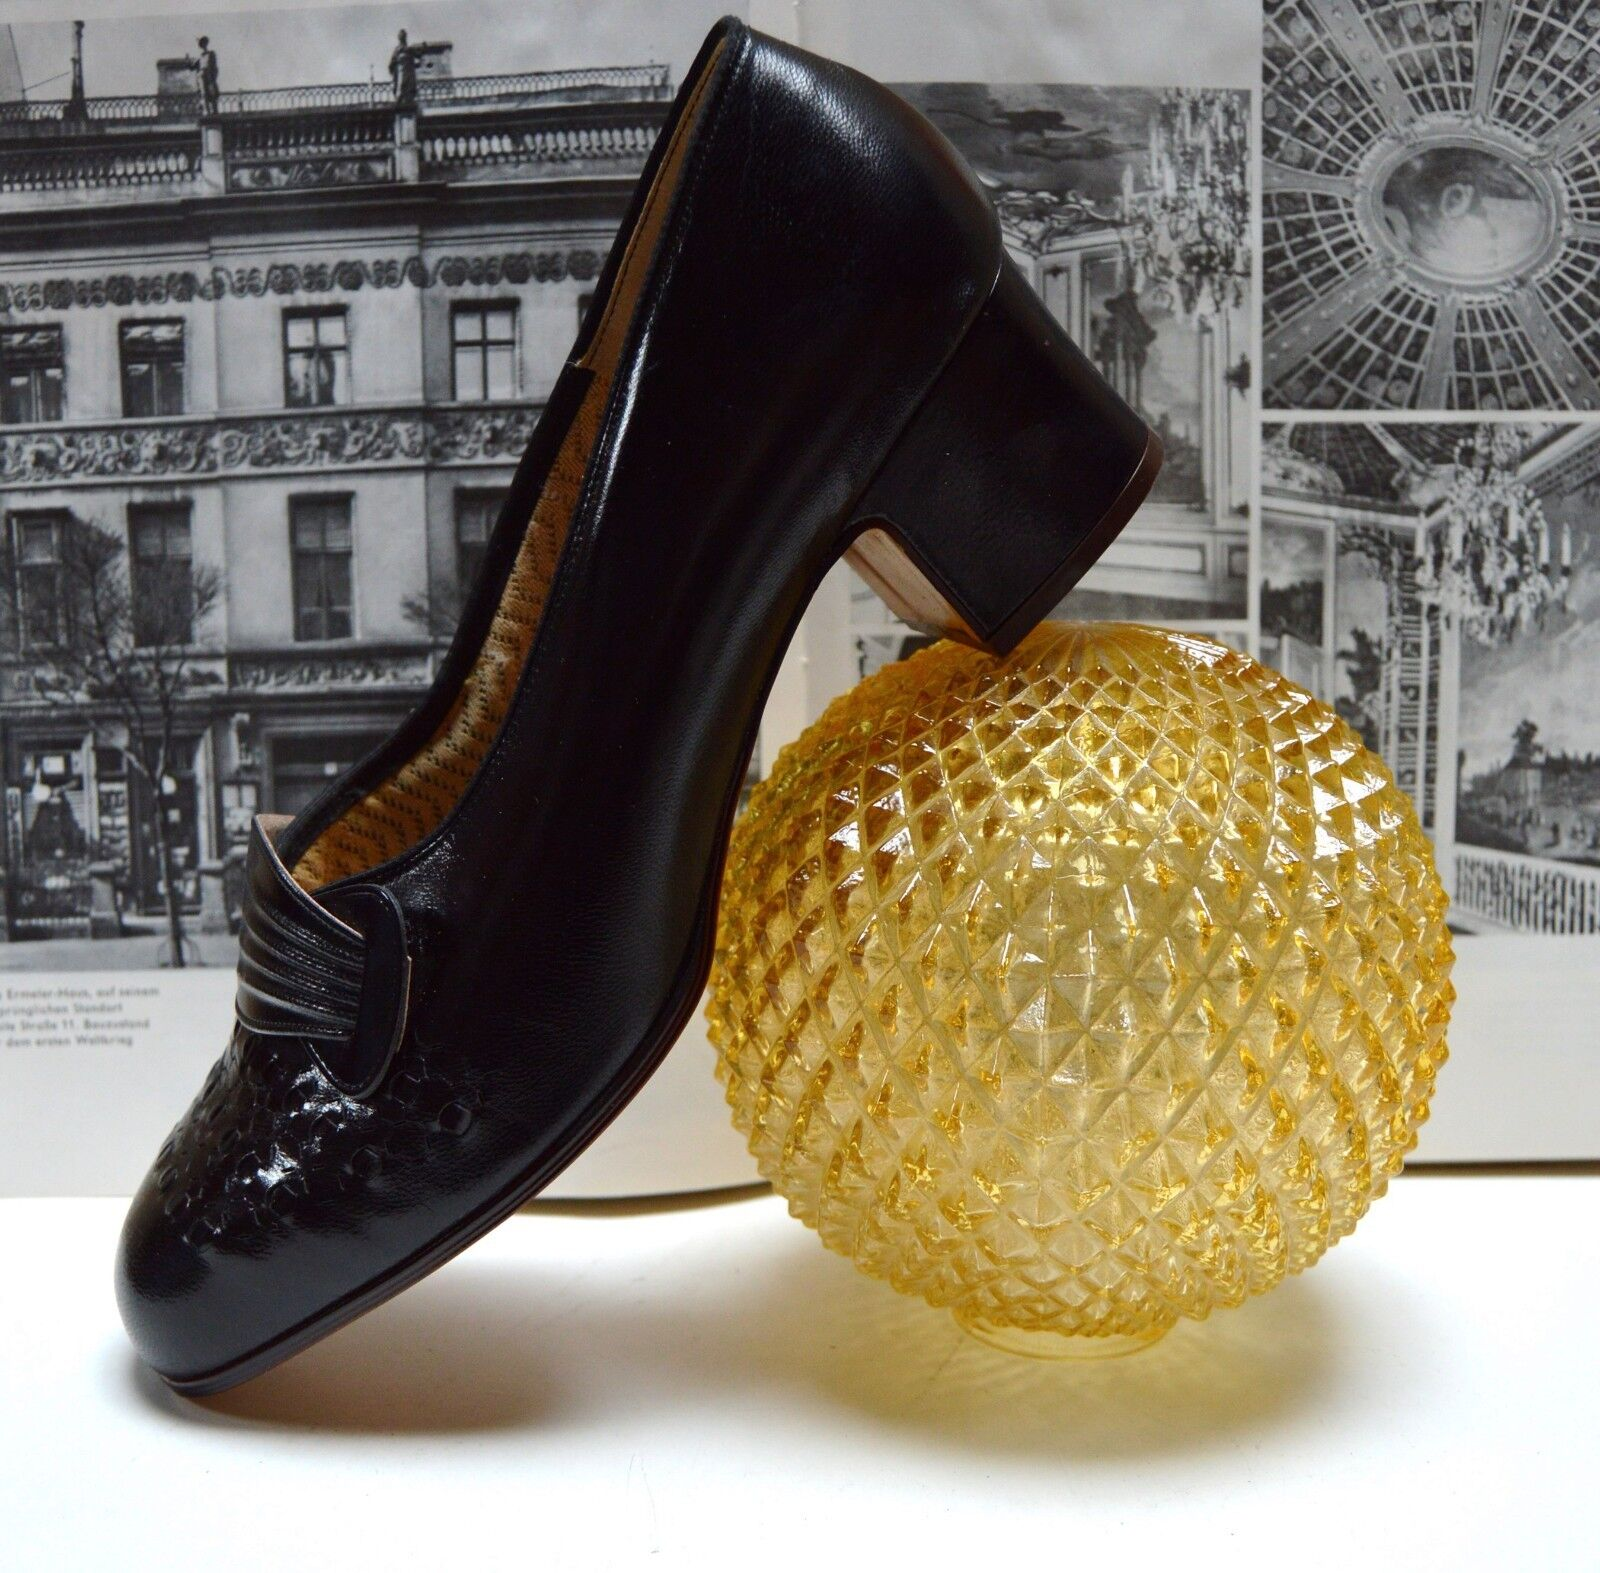 Damen Pumps Cliviée 60er TRUE VINTAGE 60´s schwarz naturform Blockheel 7,5 schwarz